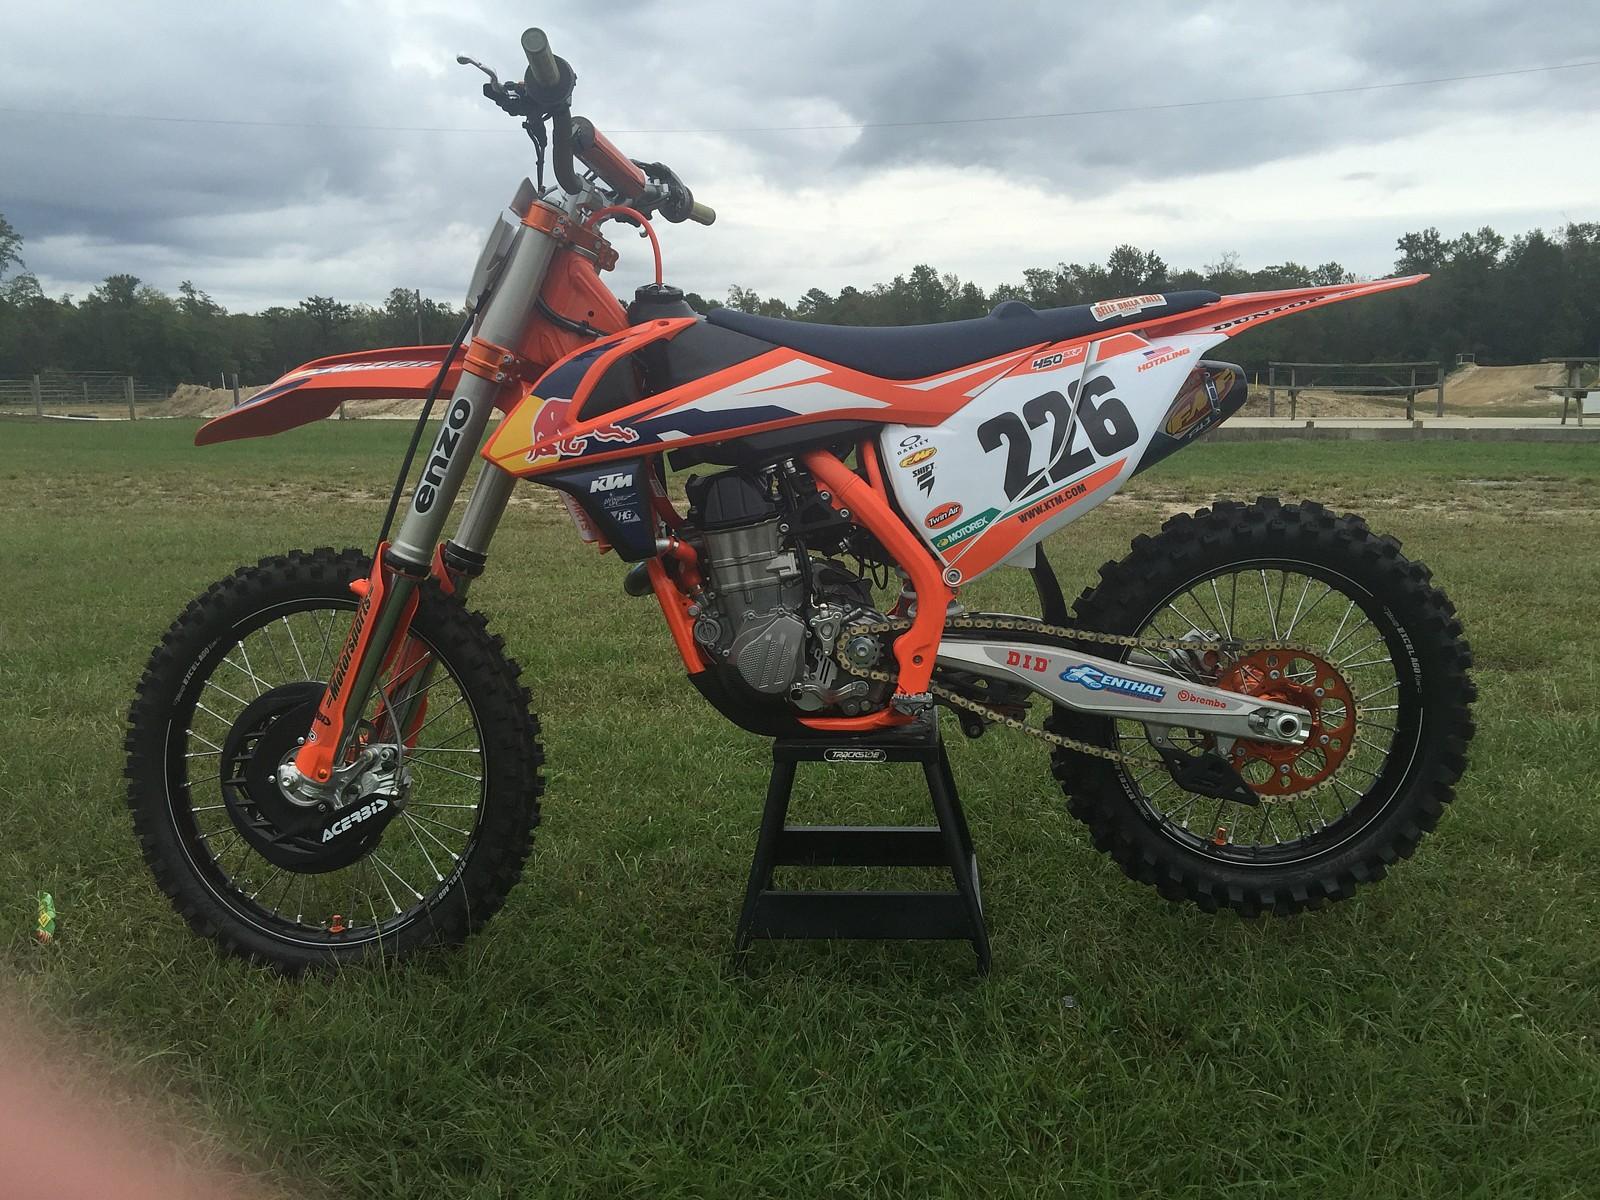 44E4C0FD-9B2B-4FE7-8DAE-EEDFB85E188A - Paul333 - Motocross Pictures - Vital MX